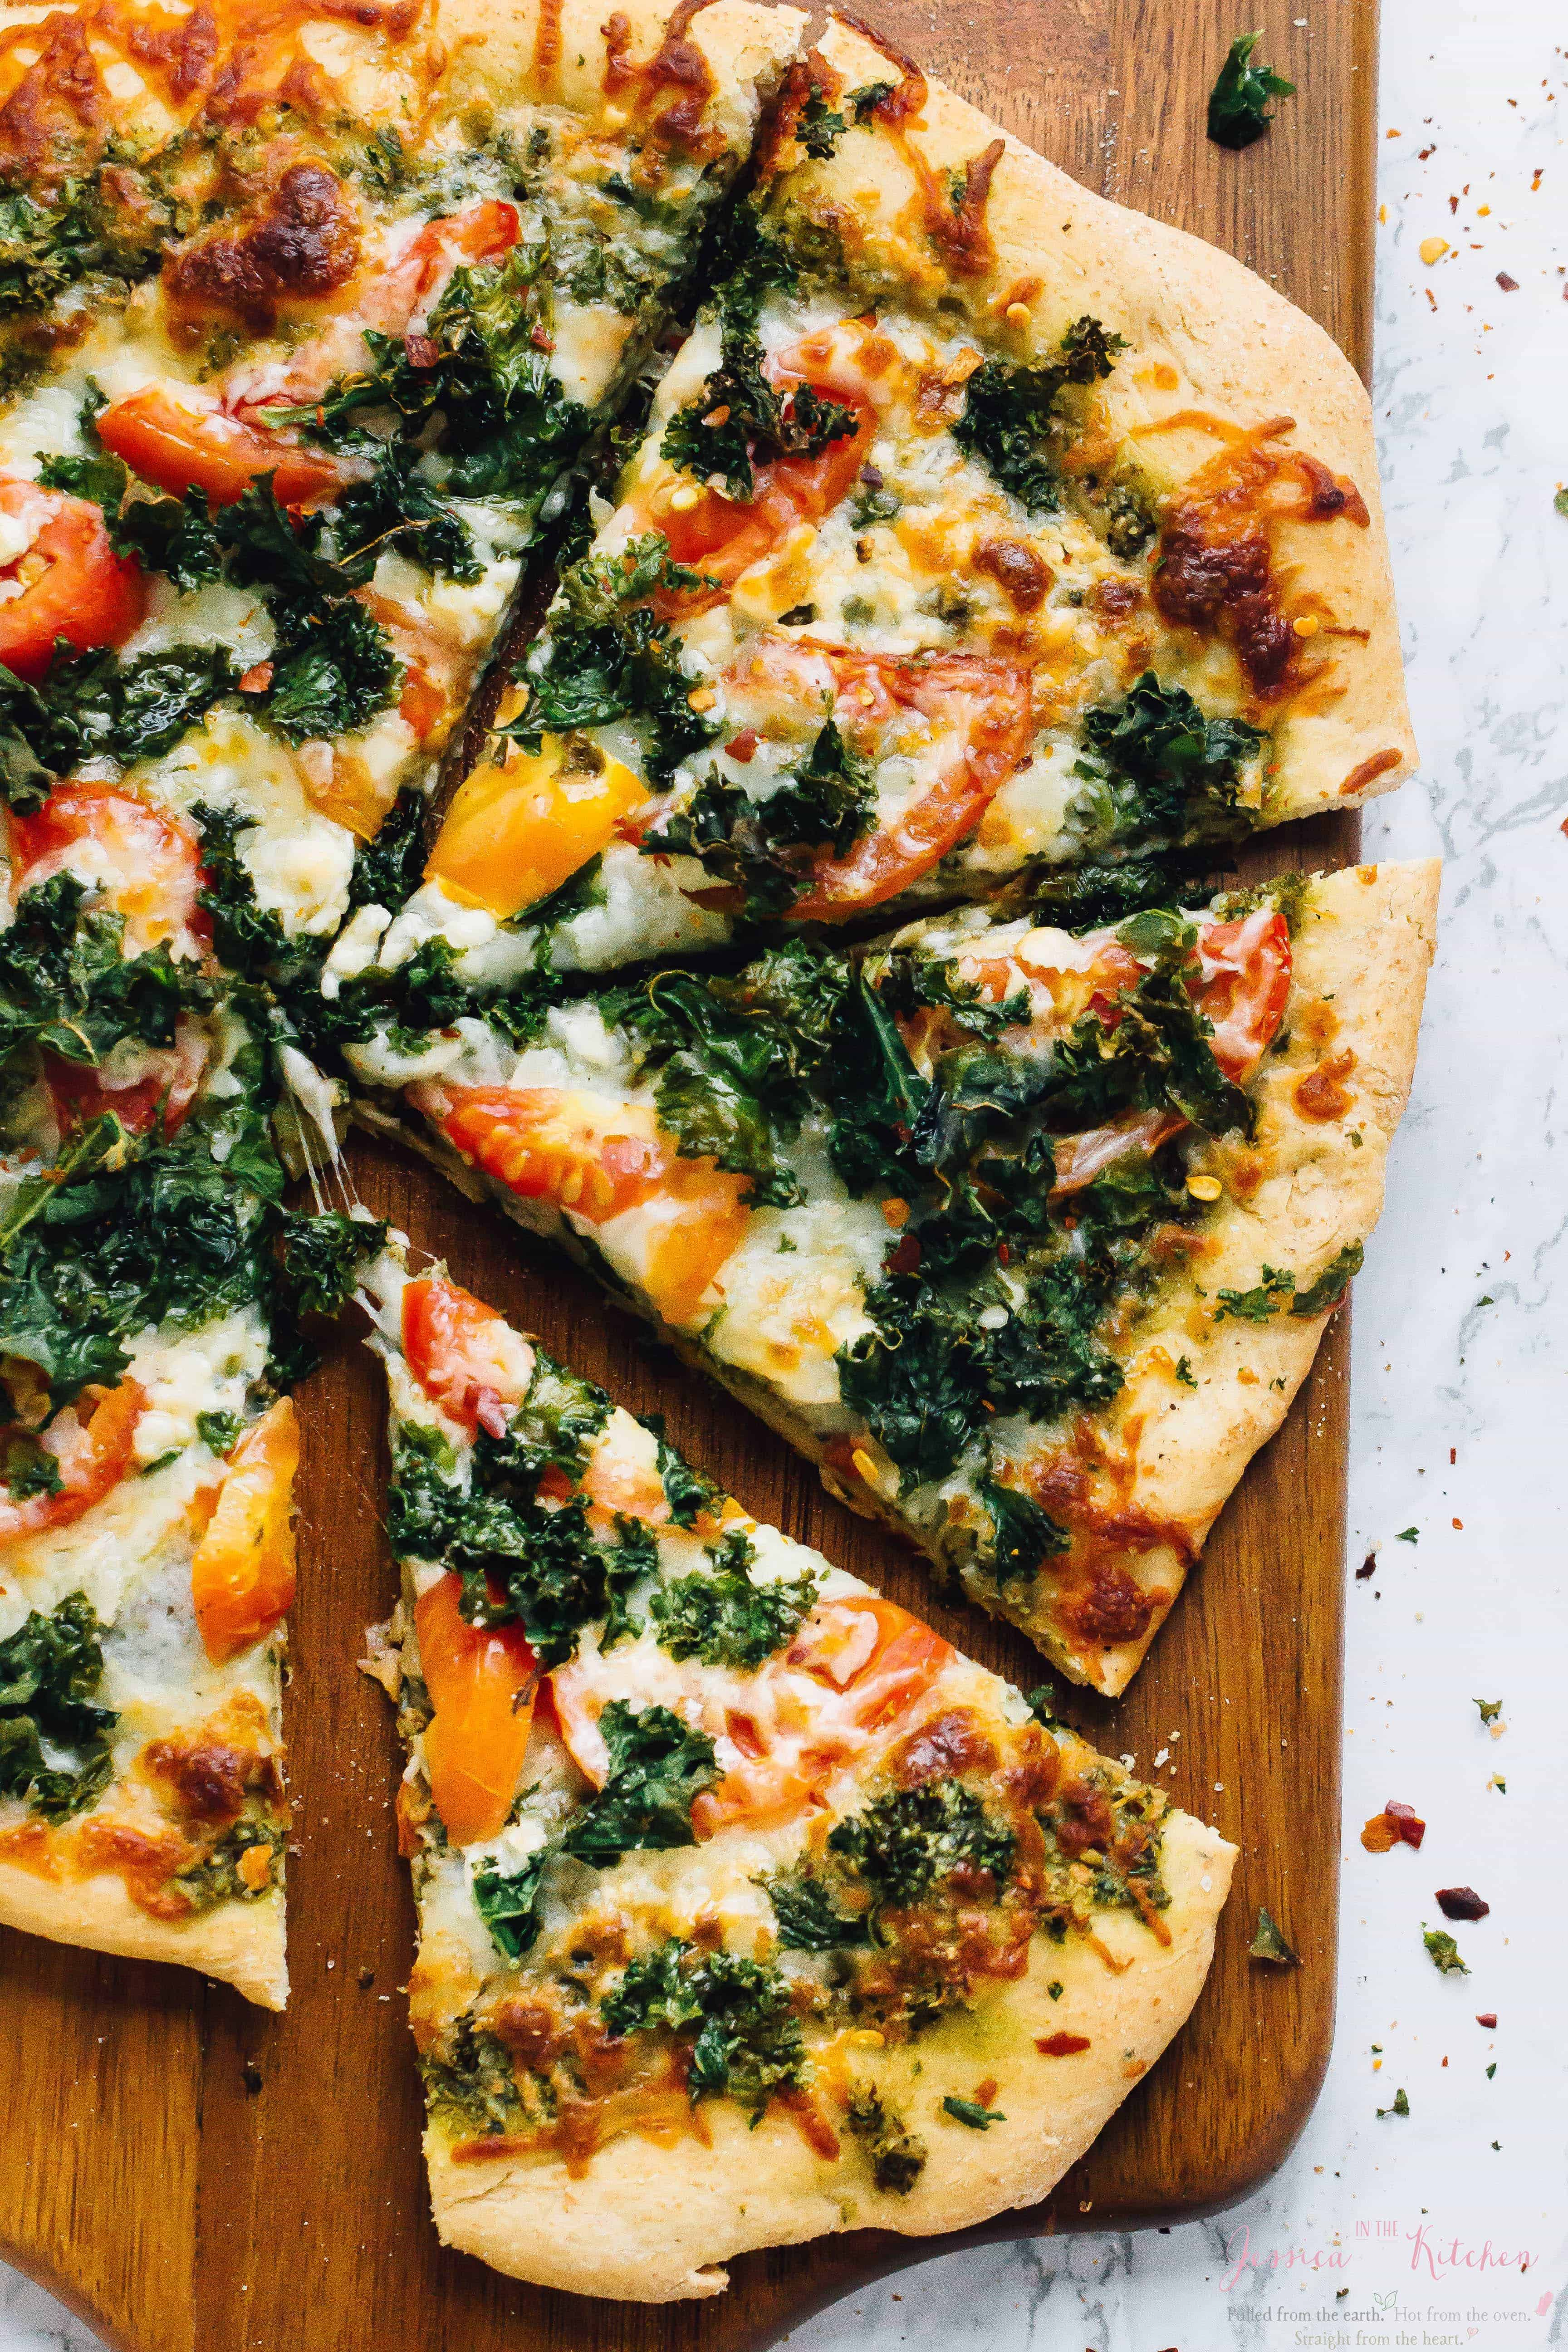 Sliced kale pesto pizza on a wooden board.